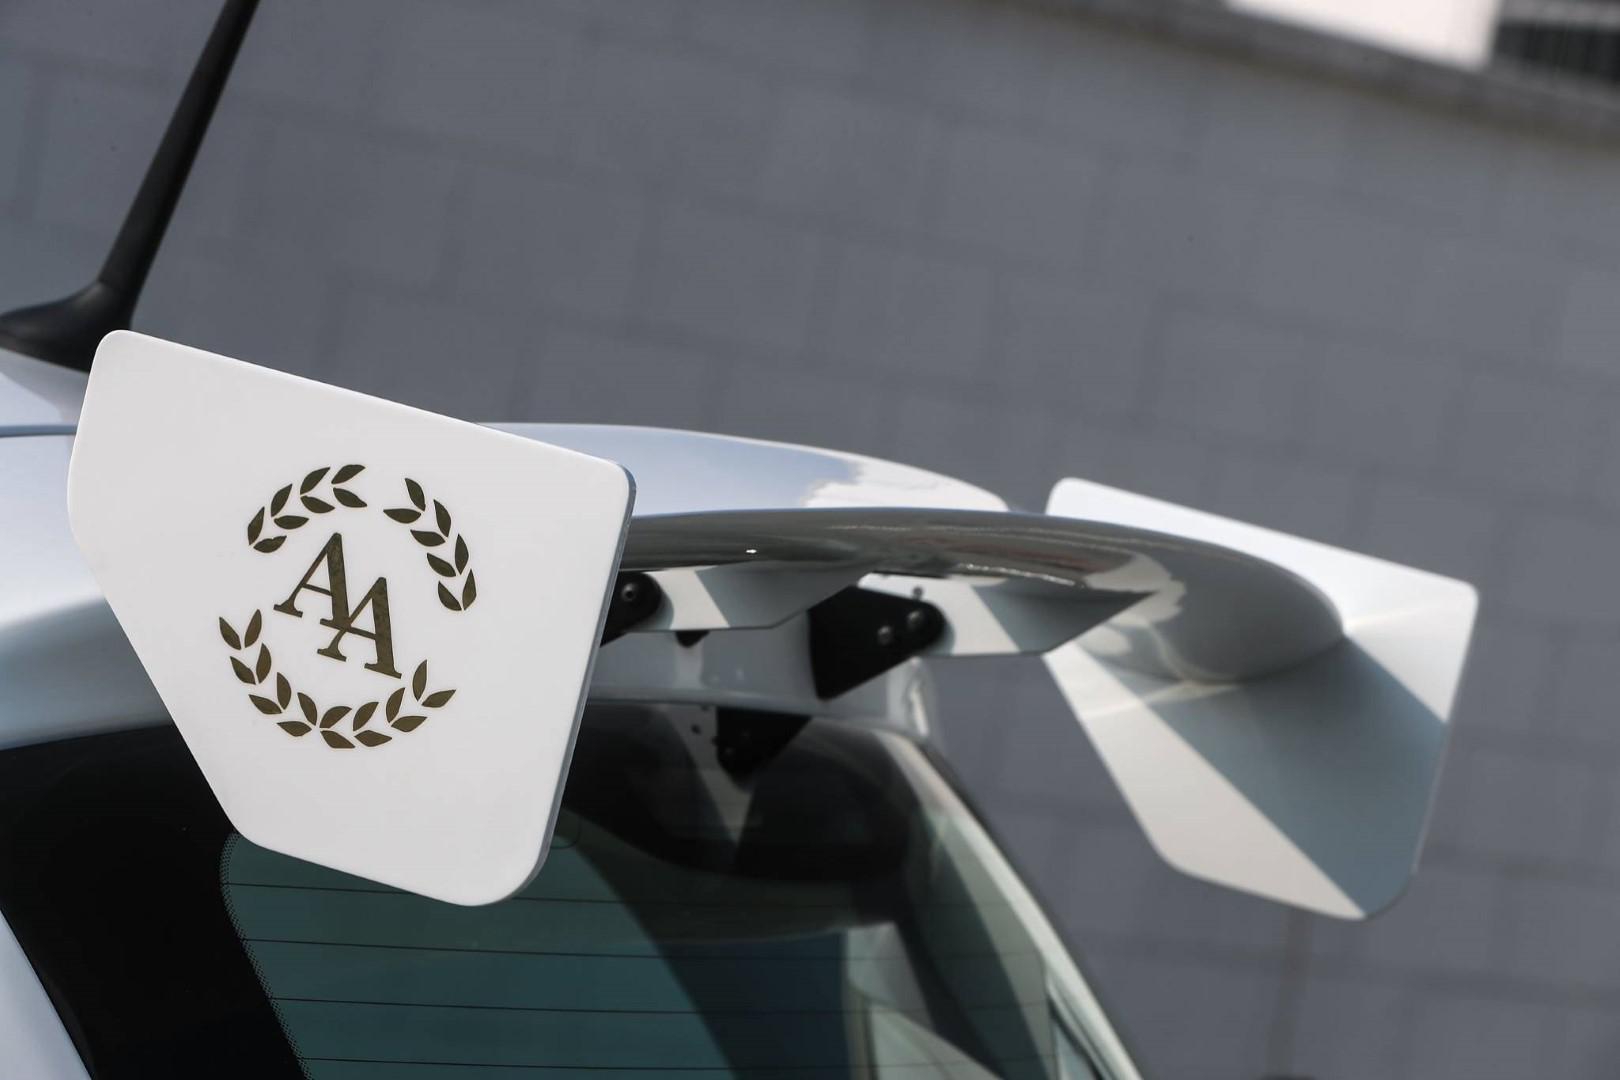 abarth-cinquone-qatar-pour-les-pilotes-tres-bling-bling-508-6.jpg